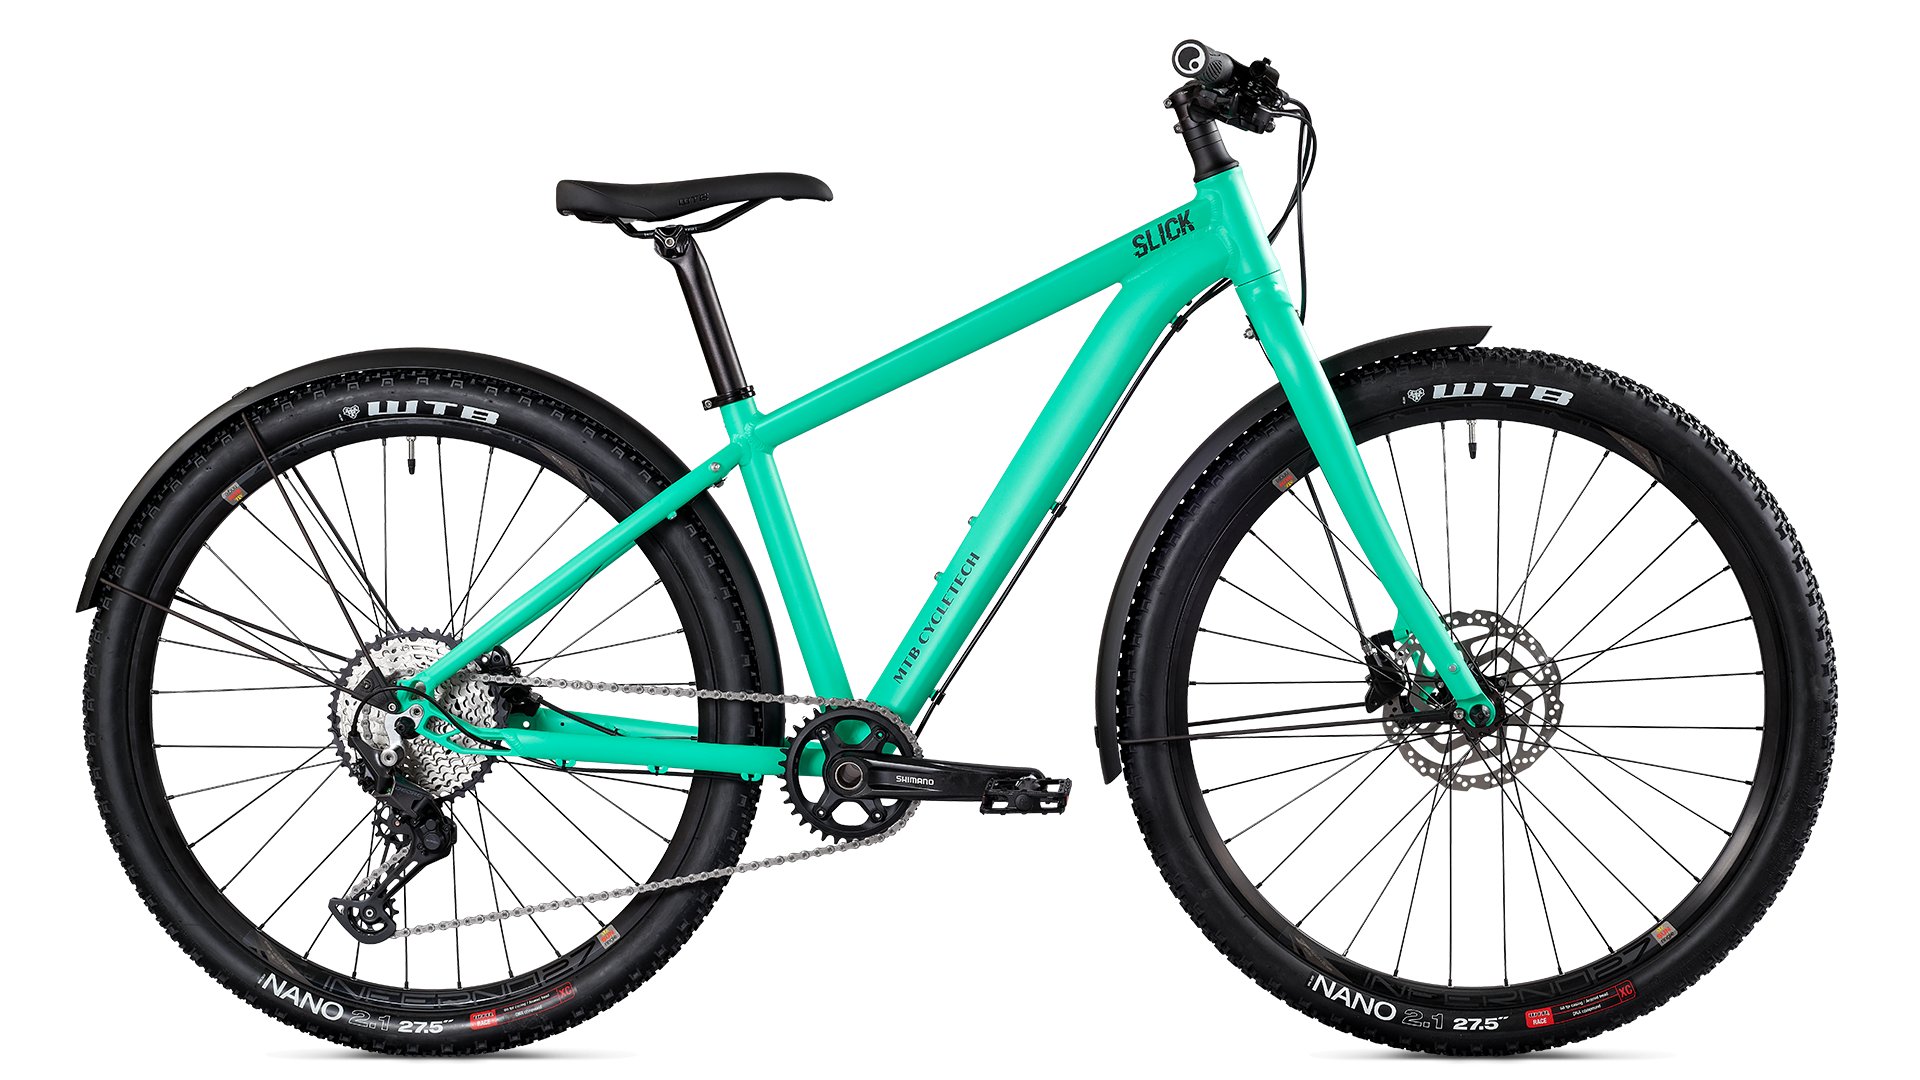 Modell - Slick - MTB Cycletech